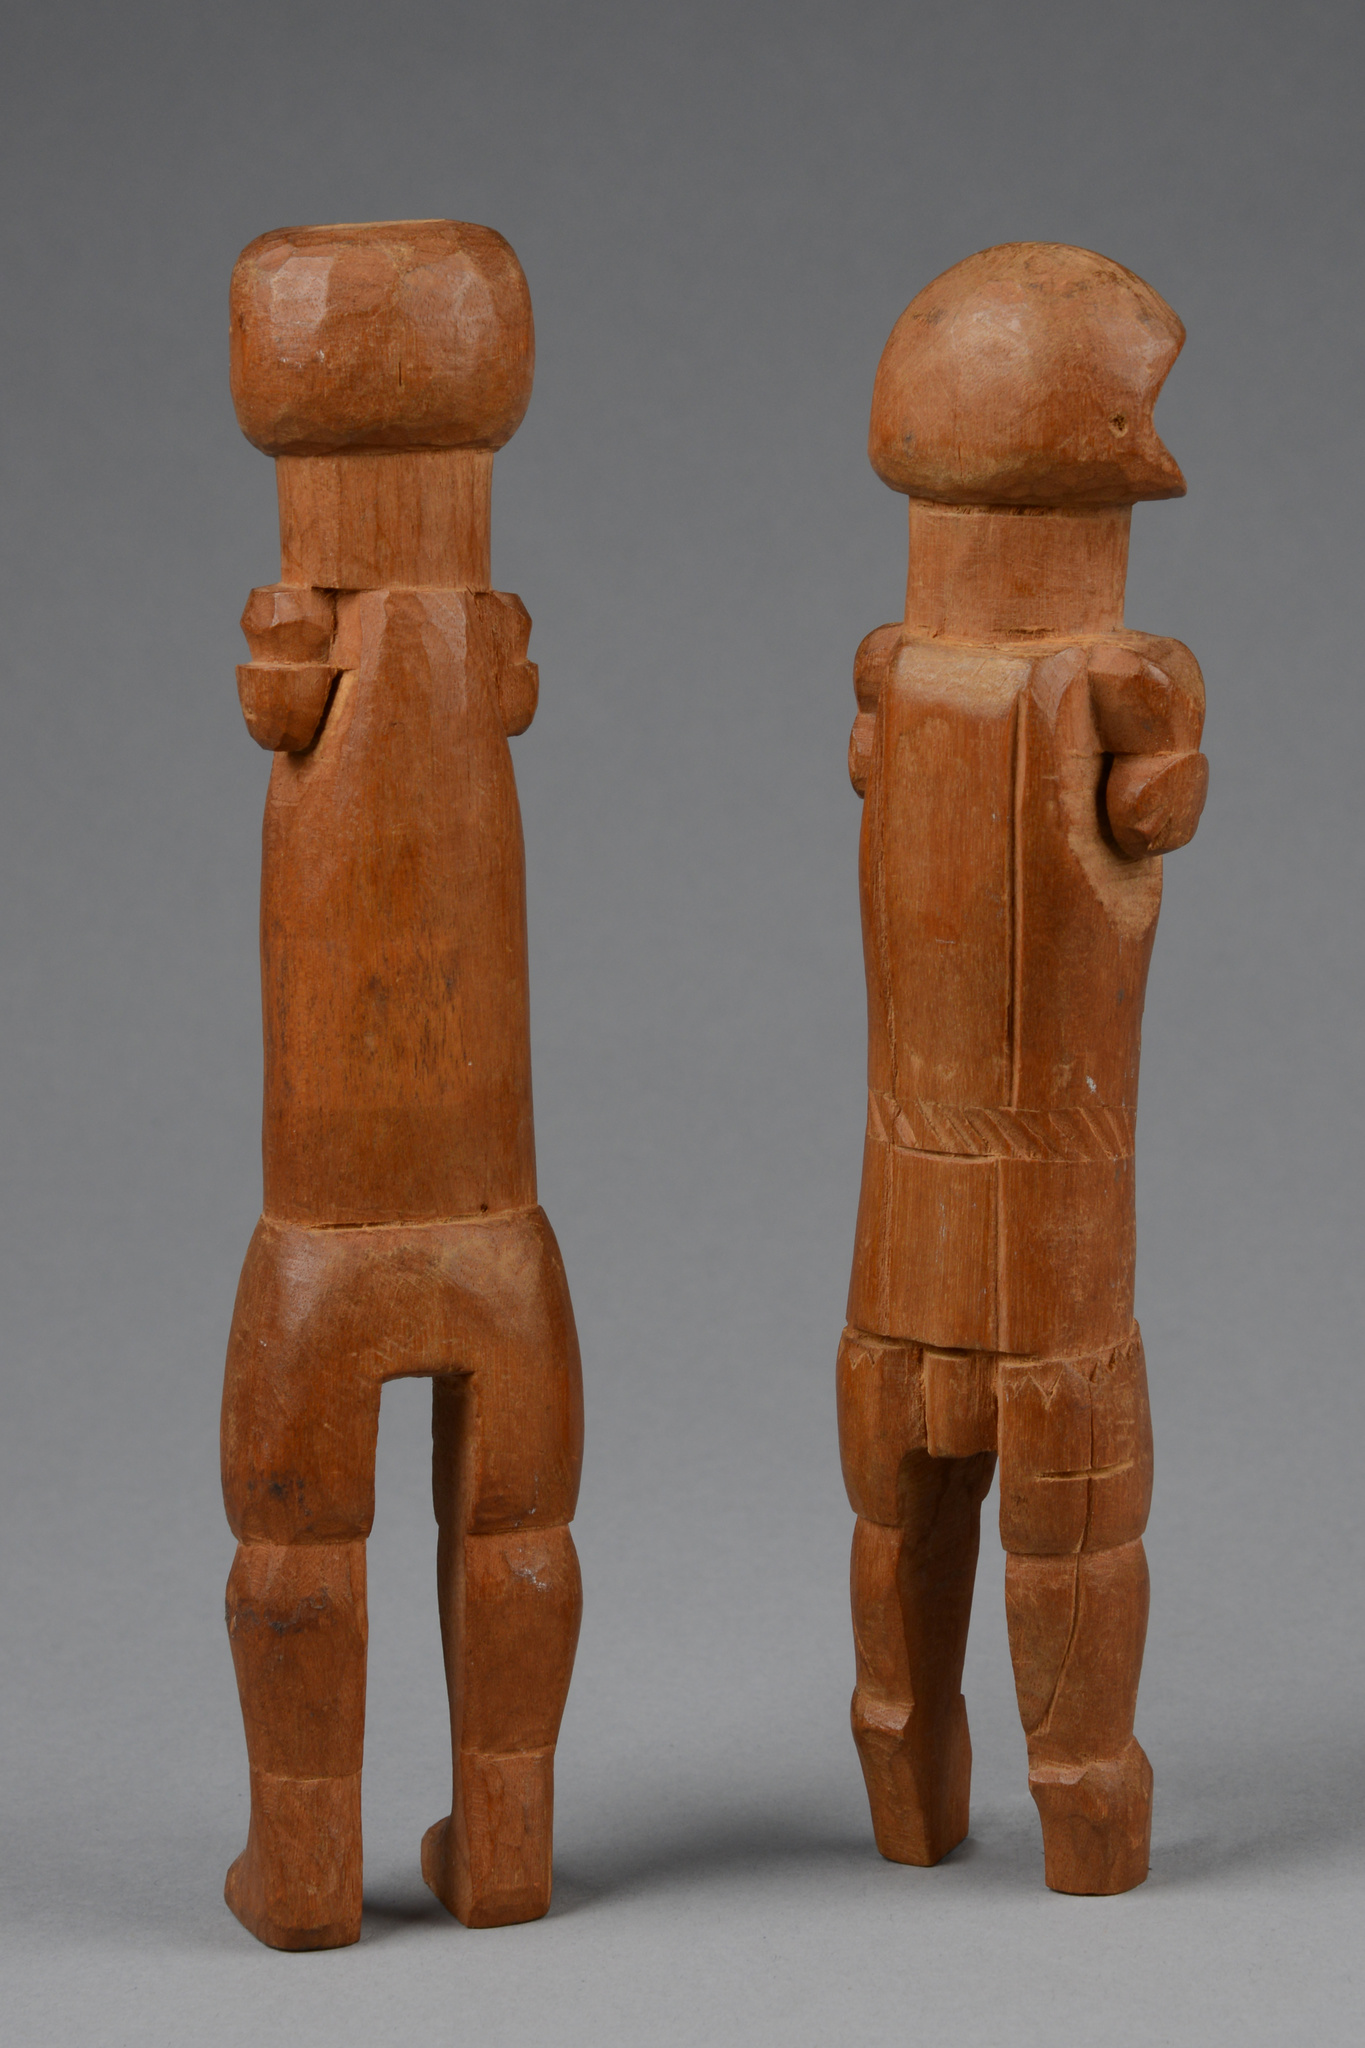 Couple de figures